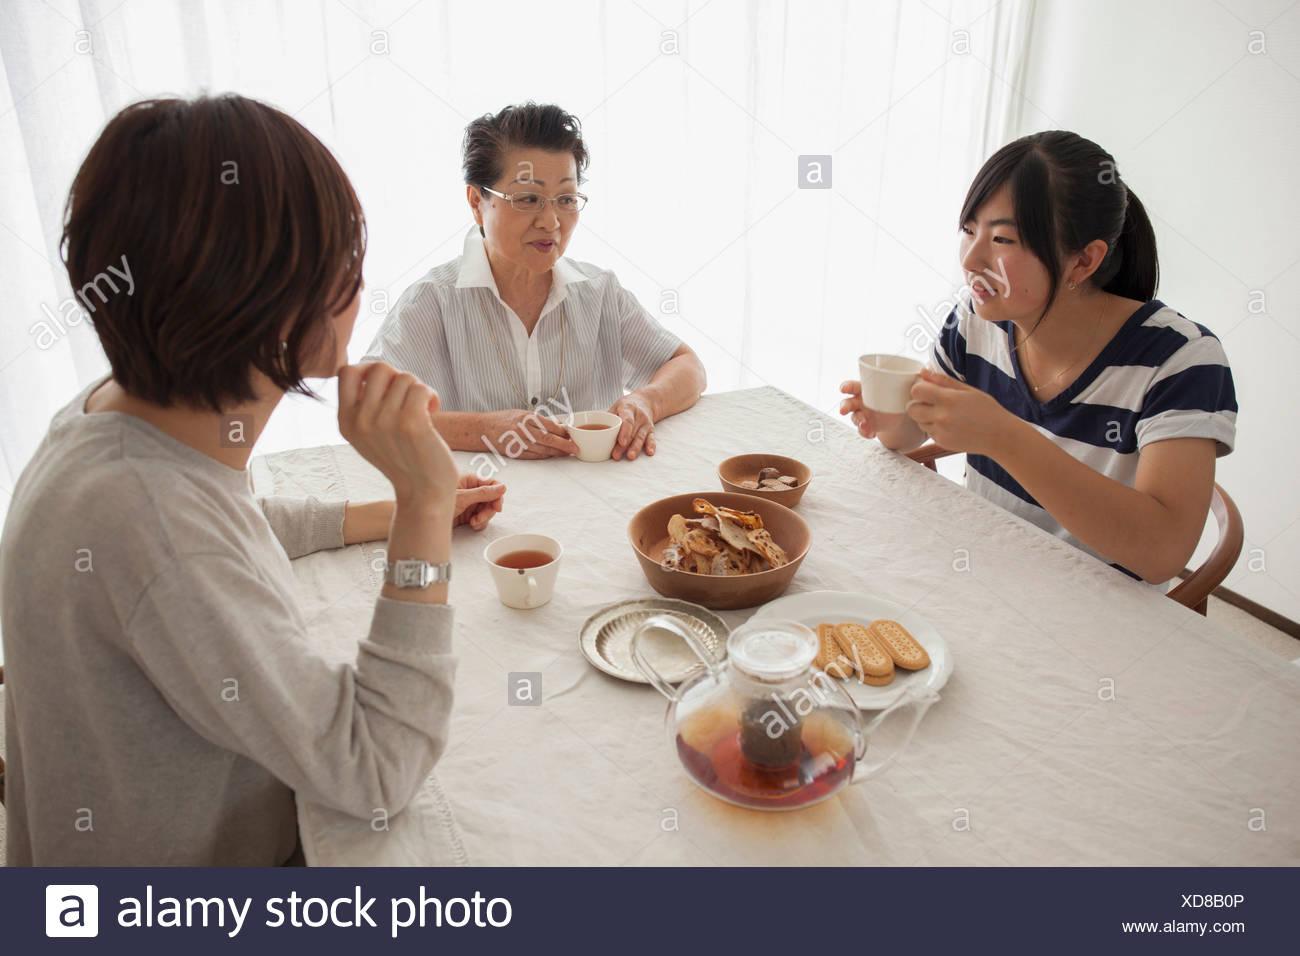 Three generation family at table - Stock Image